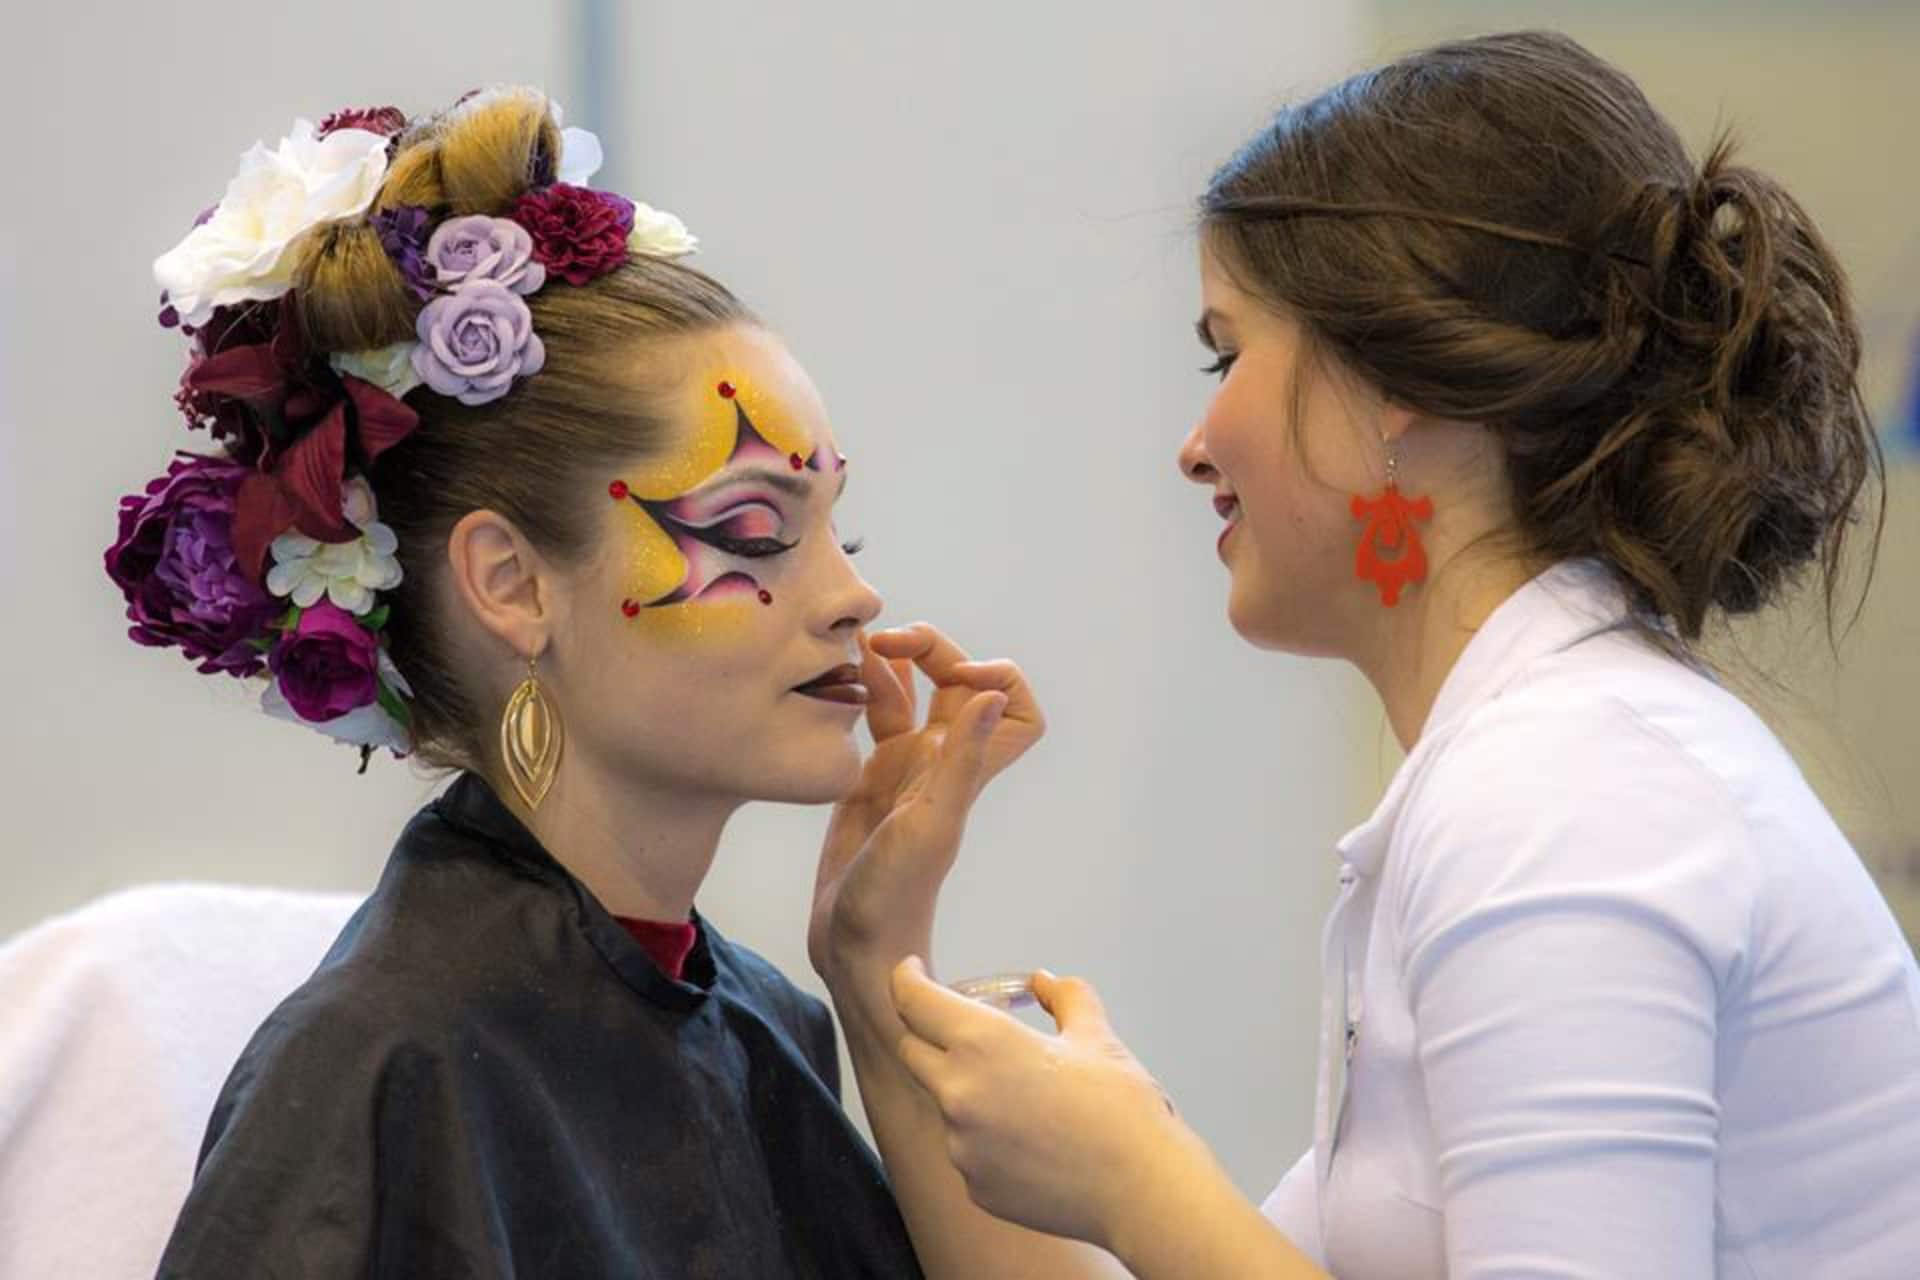 High Care weyergans kozmetika Budapest smink